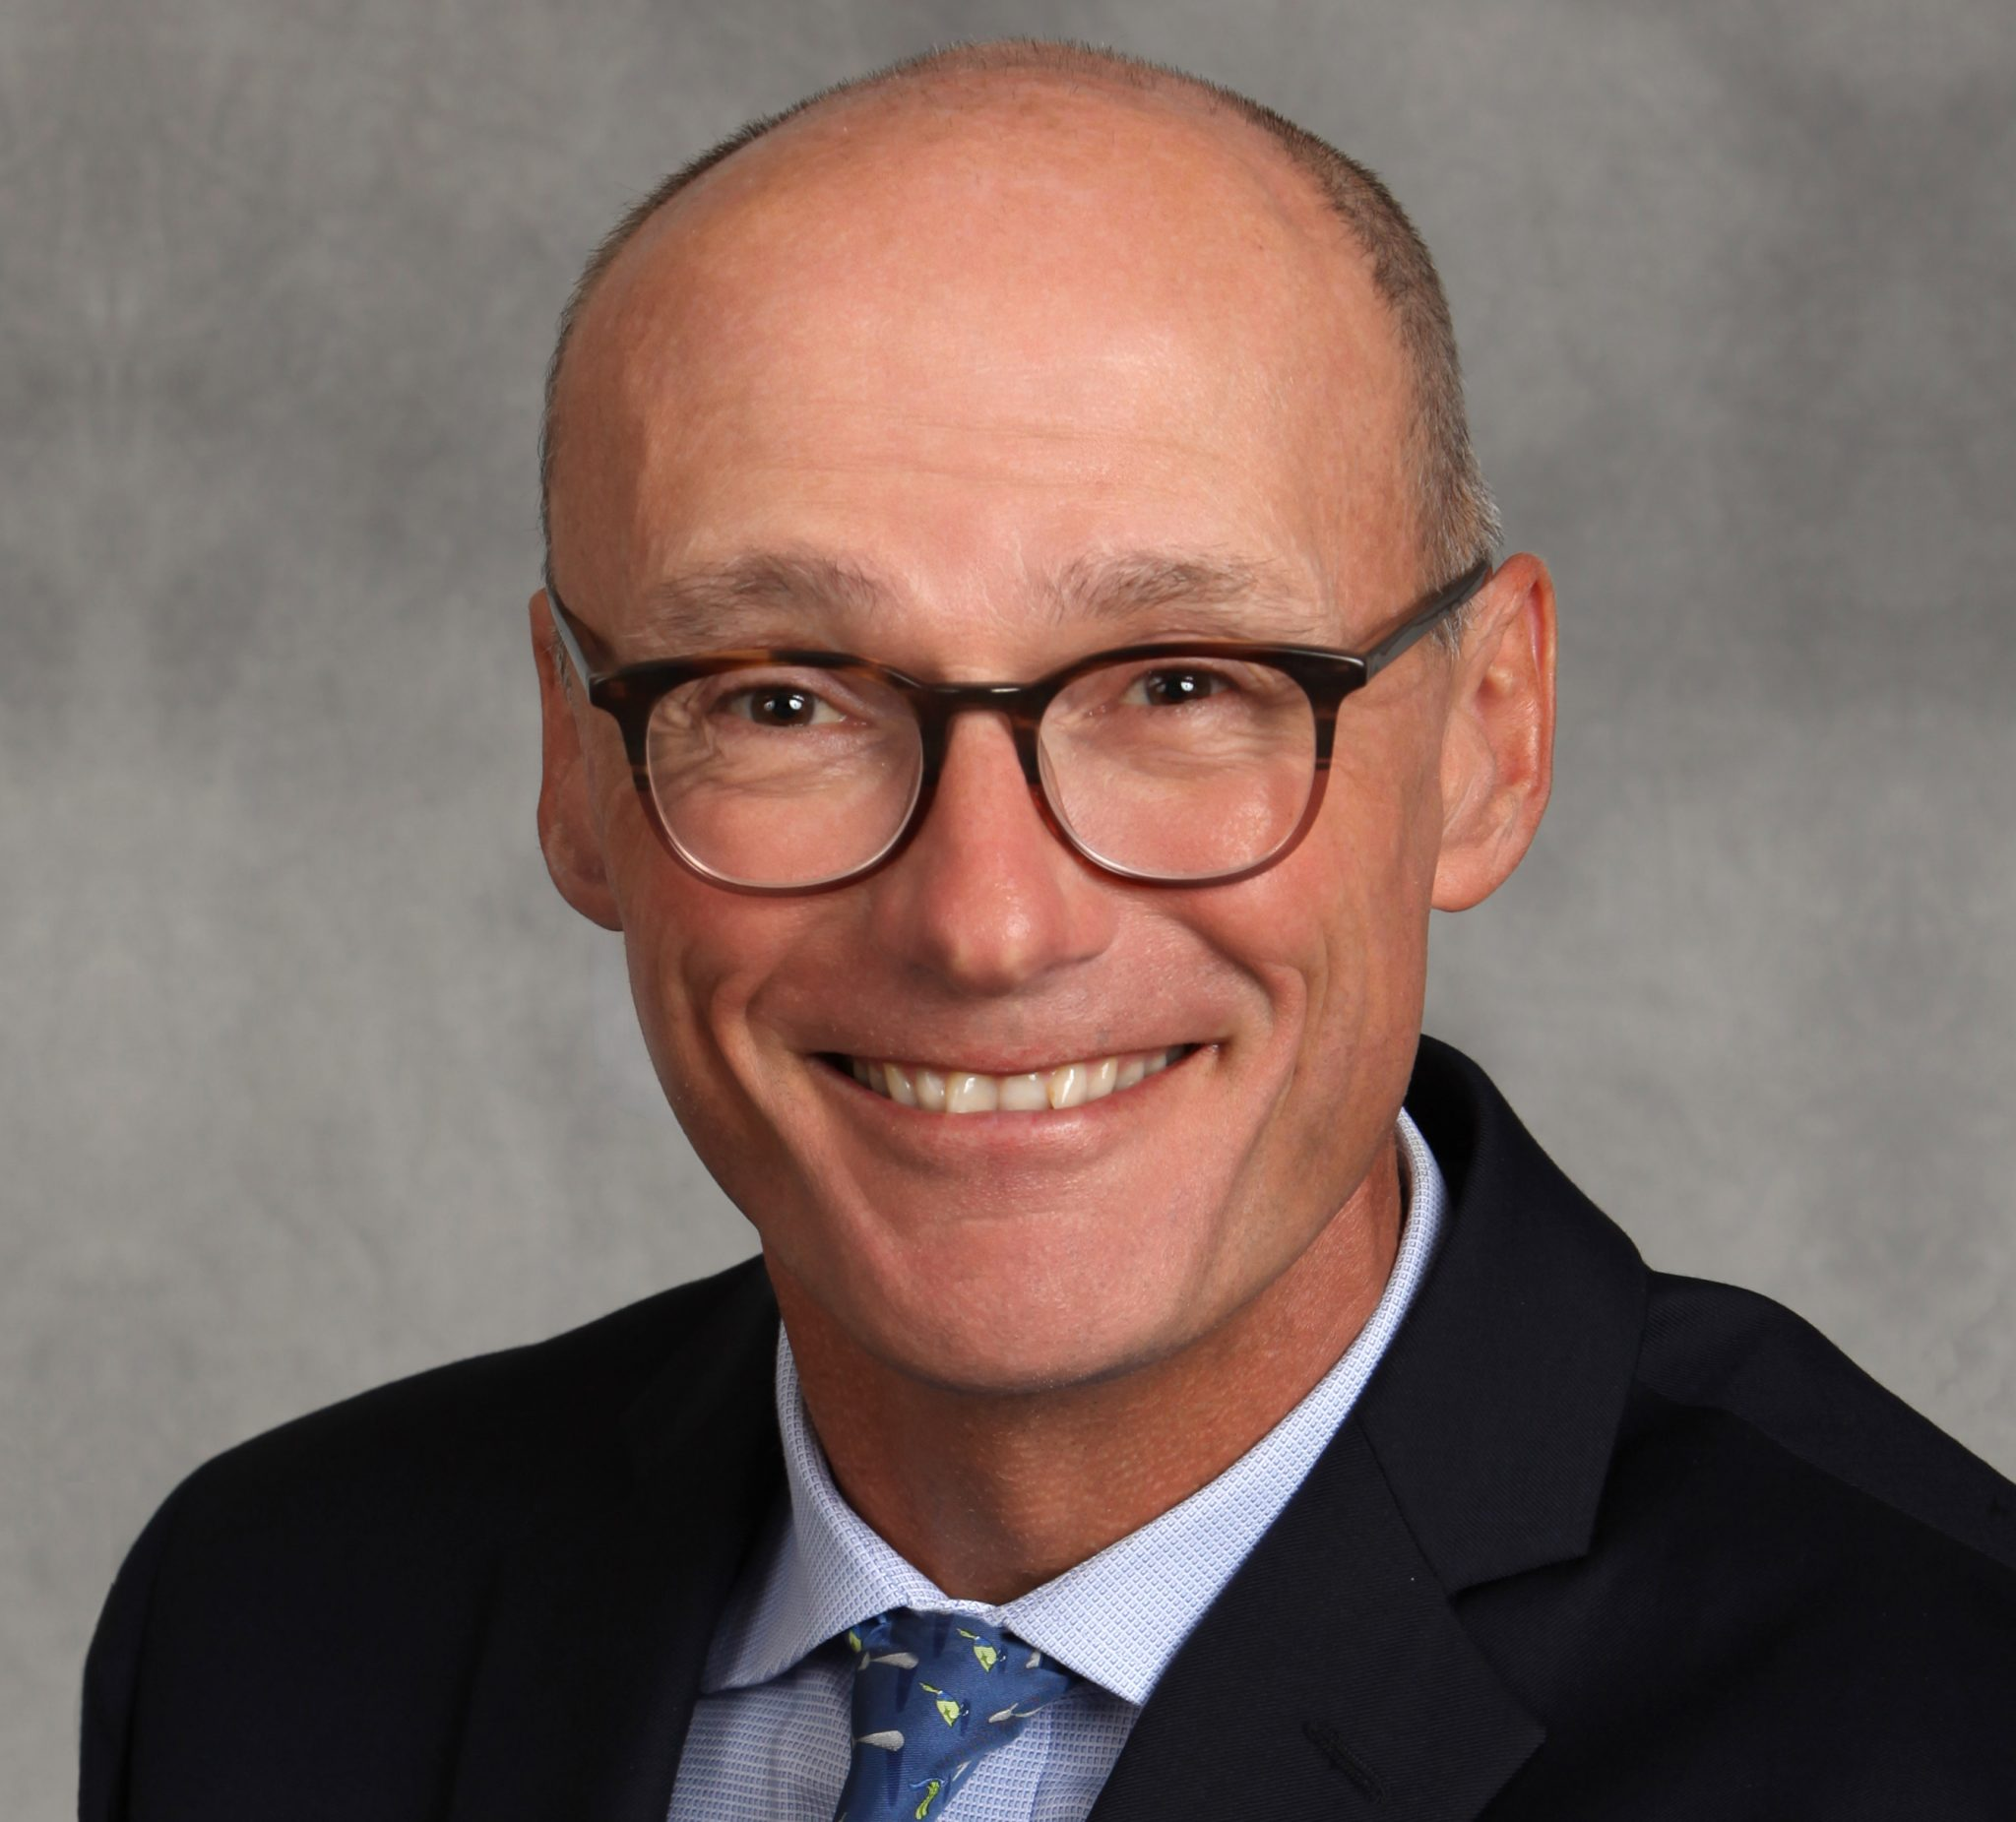 Daniel Mongan Headshot